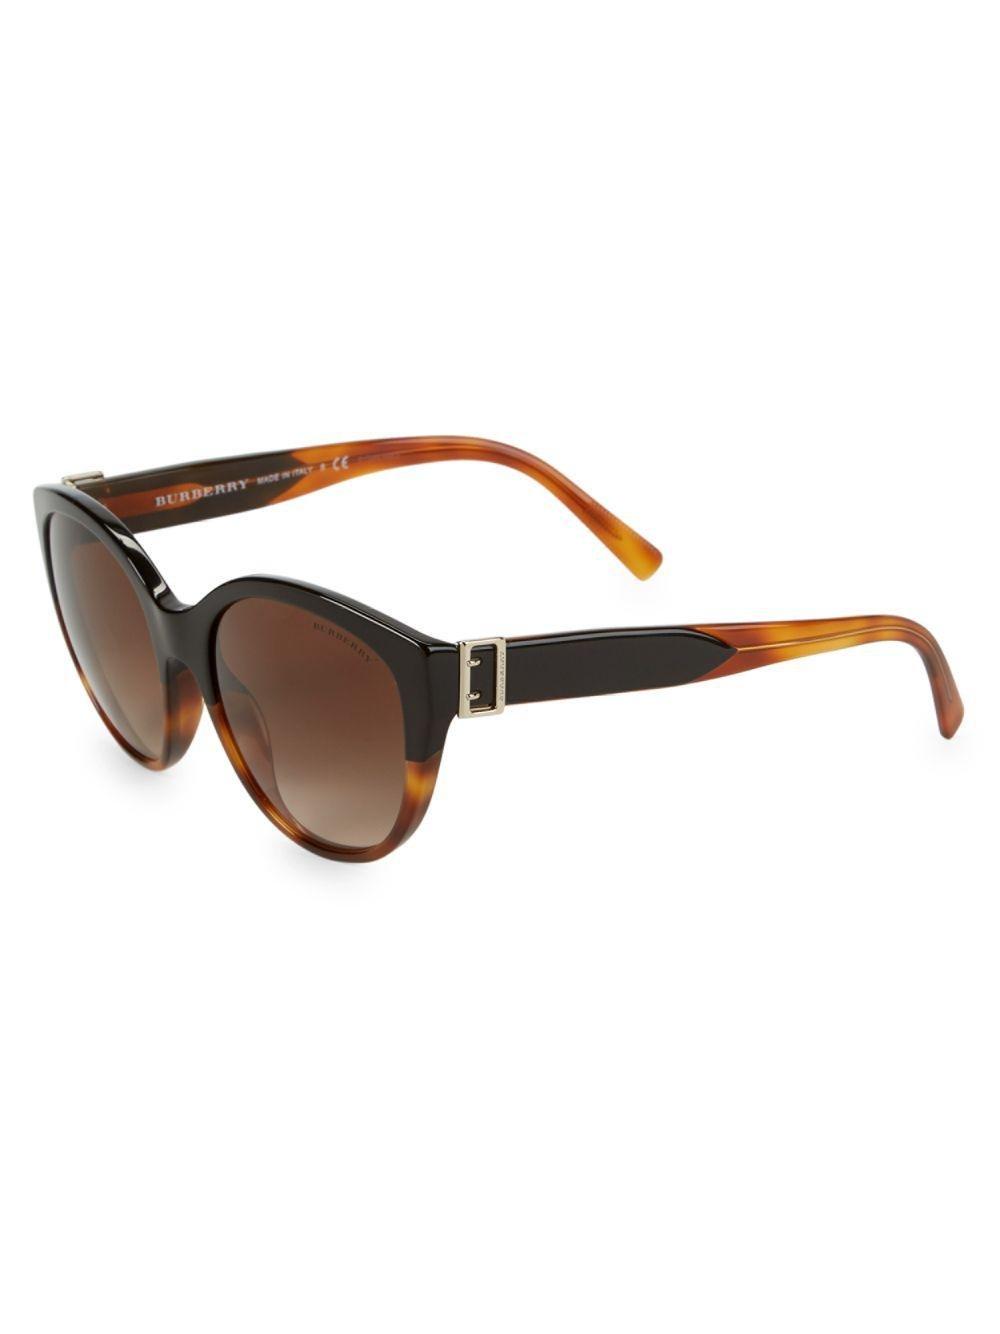 13d1052210c3 Burberry 36mm Cateye Sunglasses - Lyst